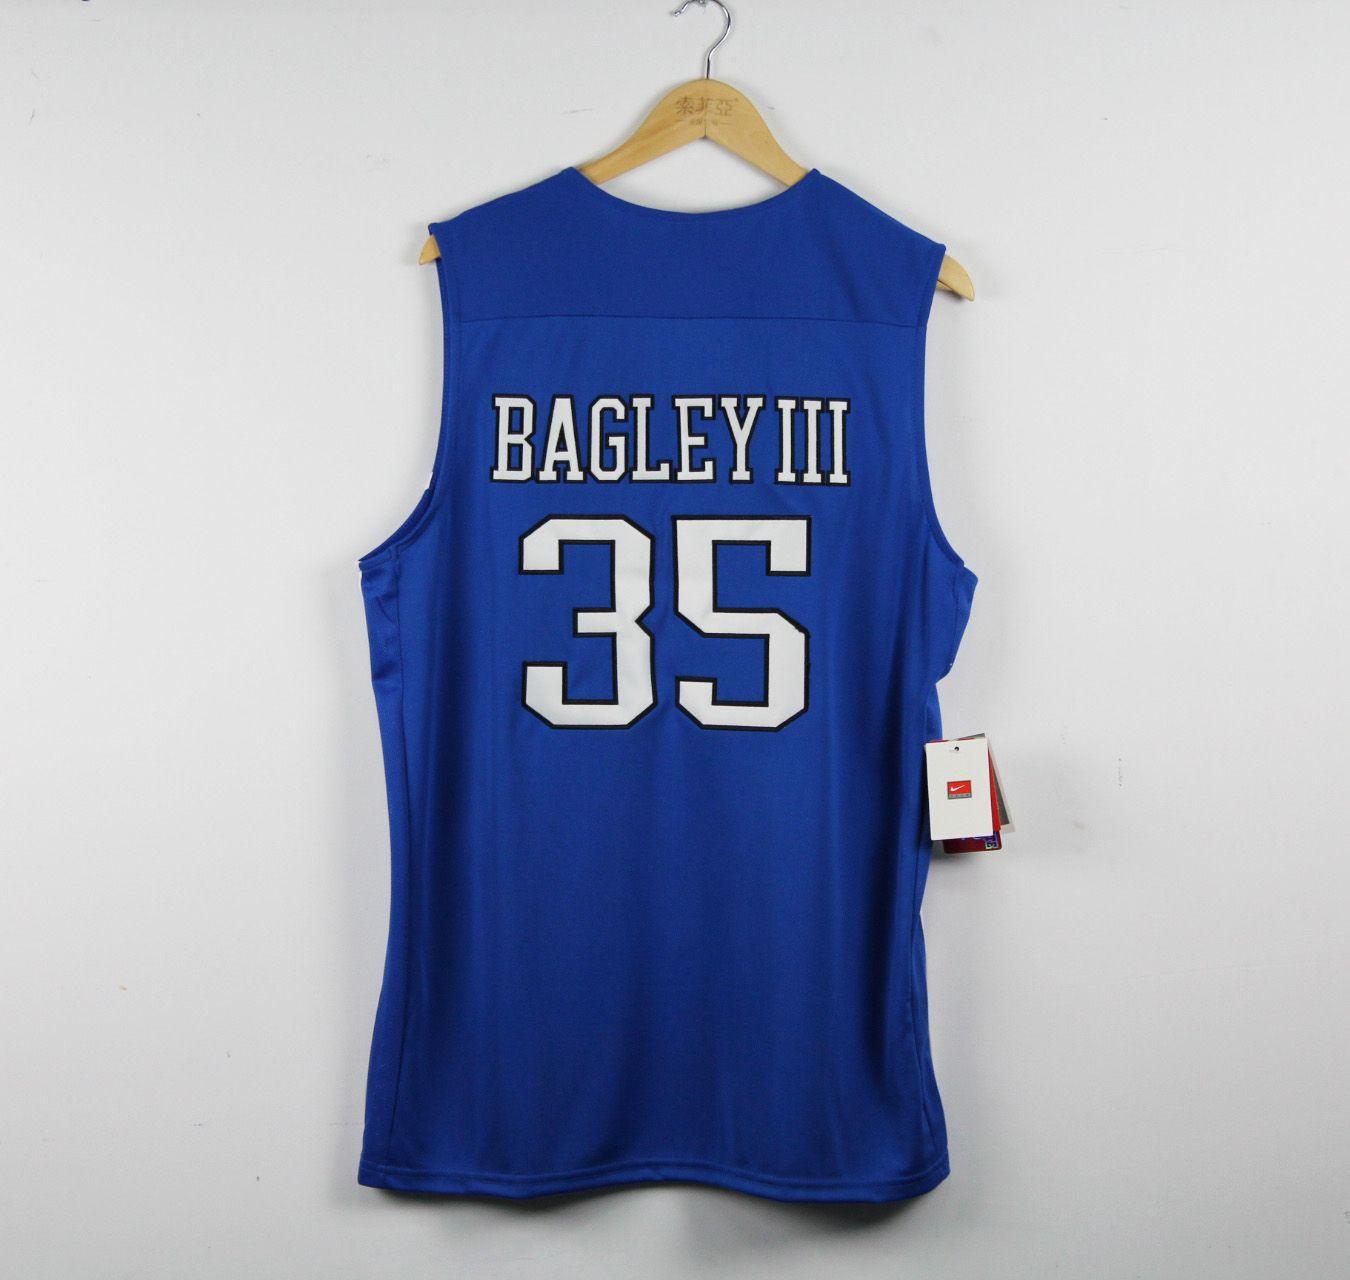 huge discount a3d9d 7f50f NCAA Marvin Bagley III #35 Duke Basketball Jerseys Nike ...